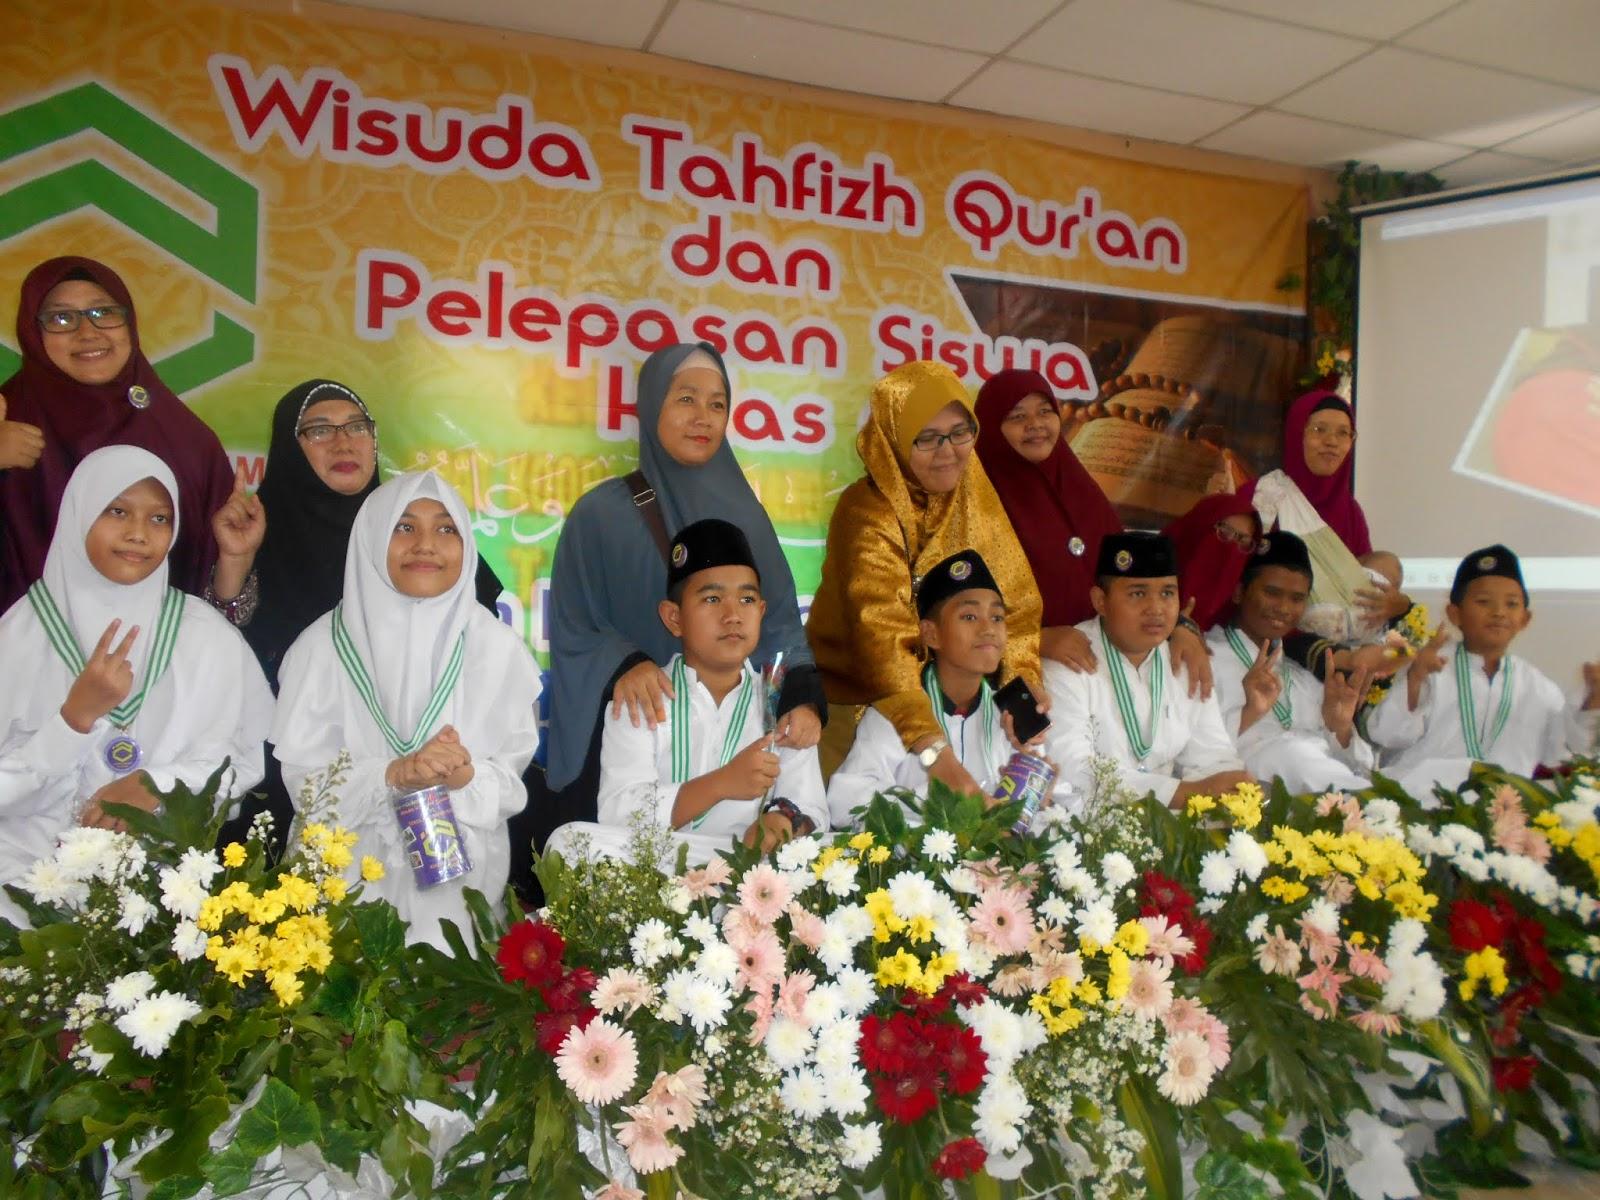 Pelepasan Siswa I Kelas Vi Wisuda Tahfidz Sekolah Tahfizh Plus Khoiru Ummah Ciledug